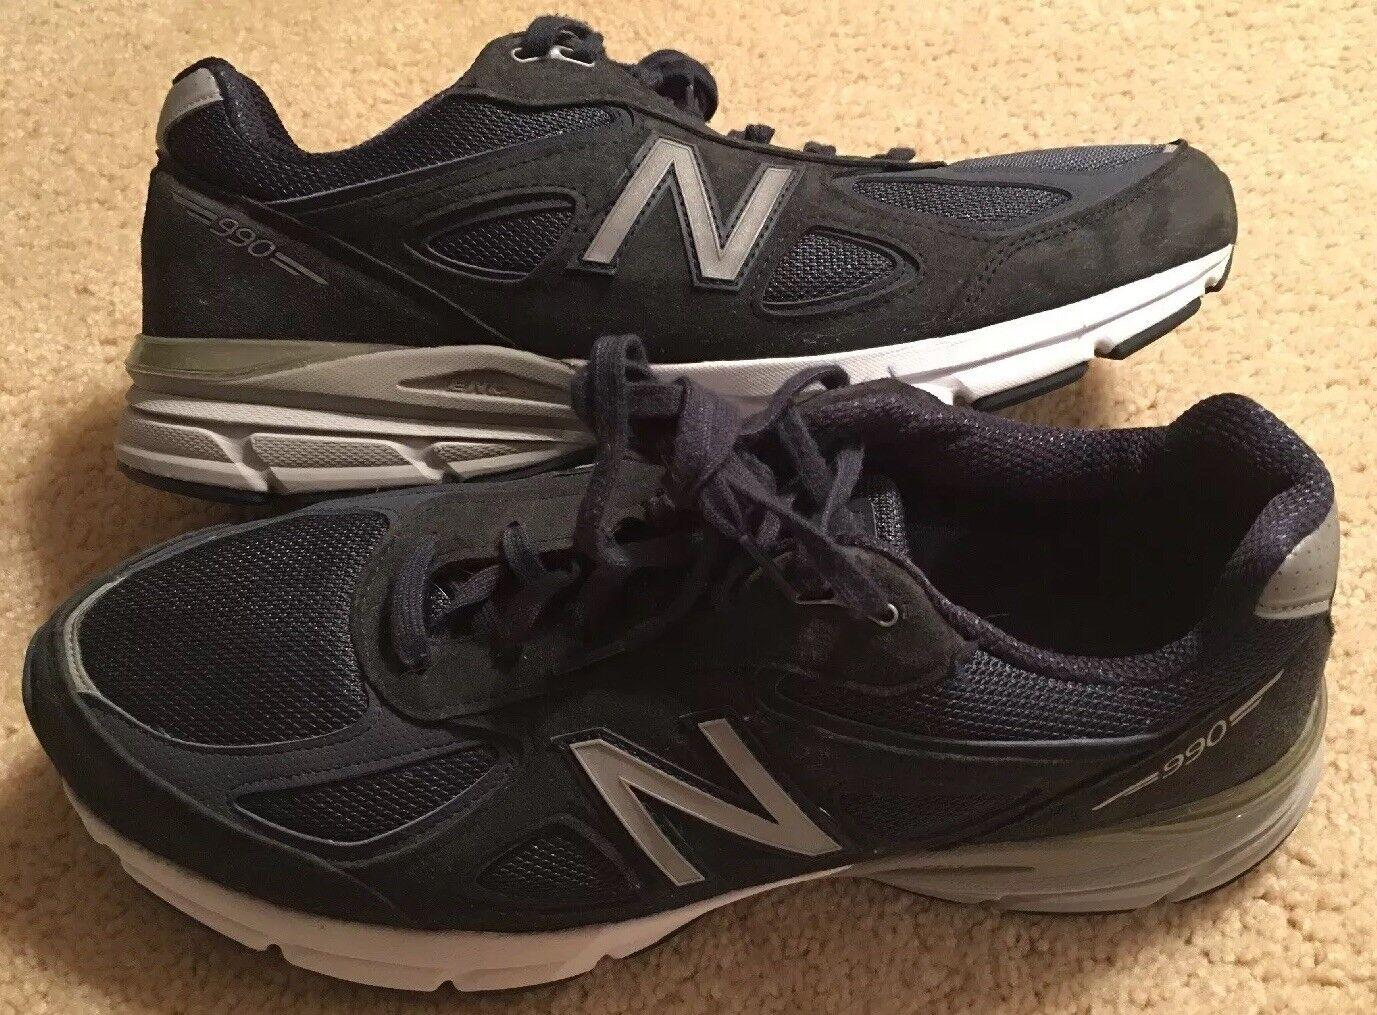 NEW BALANCE TEAM USA 990v4 shoes -Men's Running SKU M990NV4 Size 14 2E Width Mint